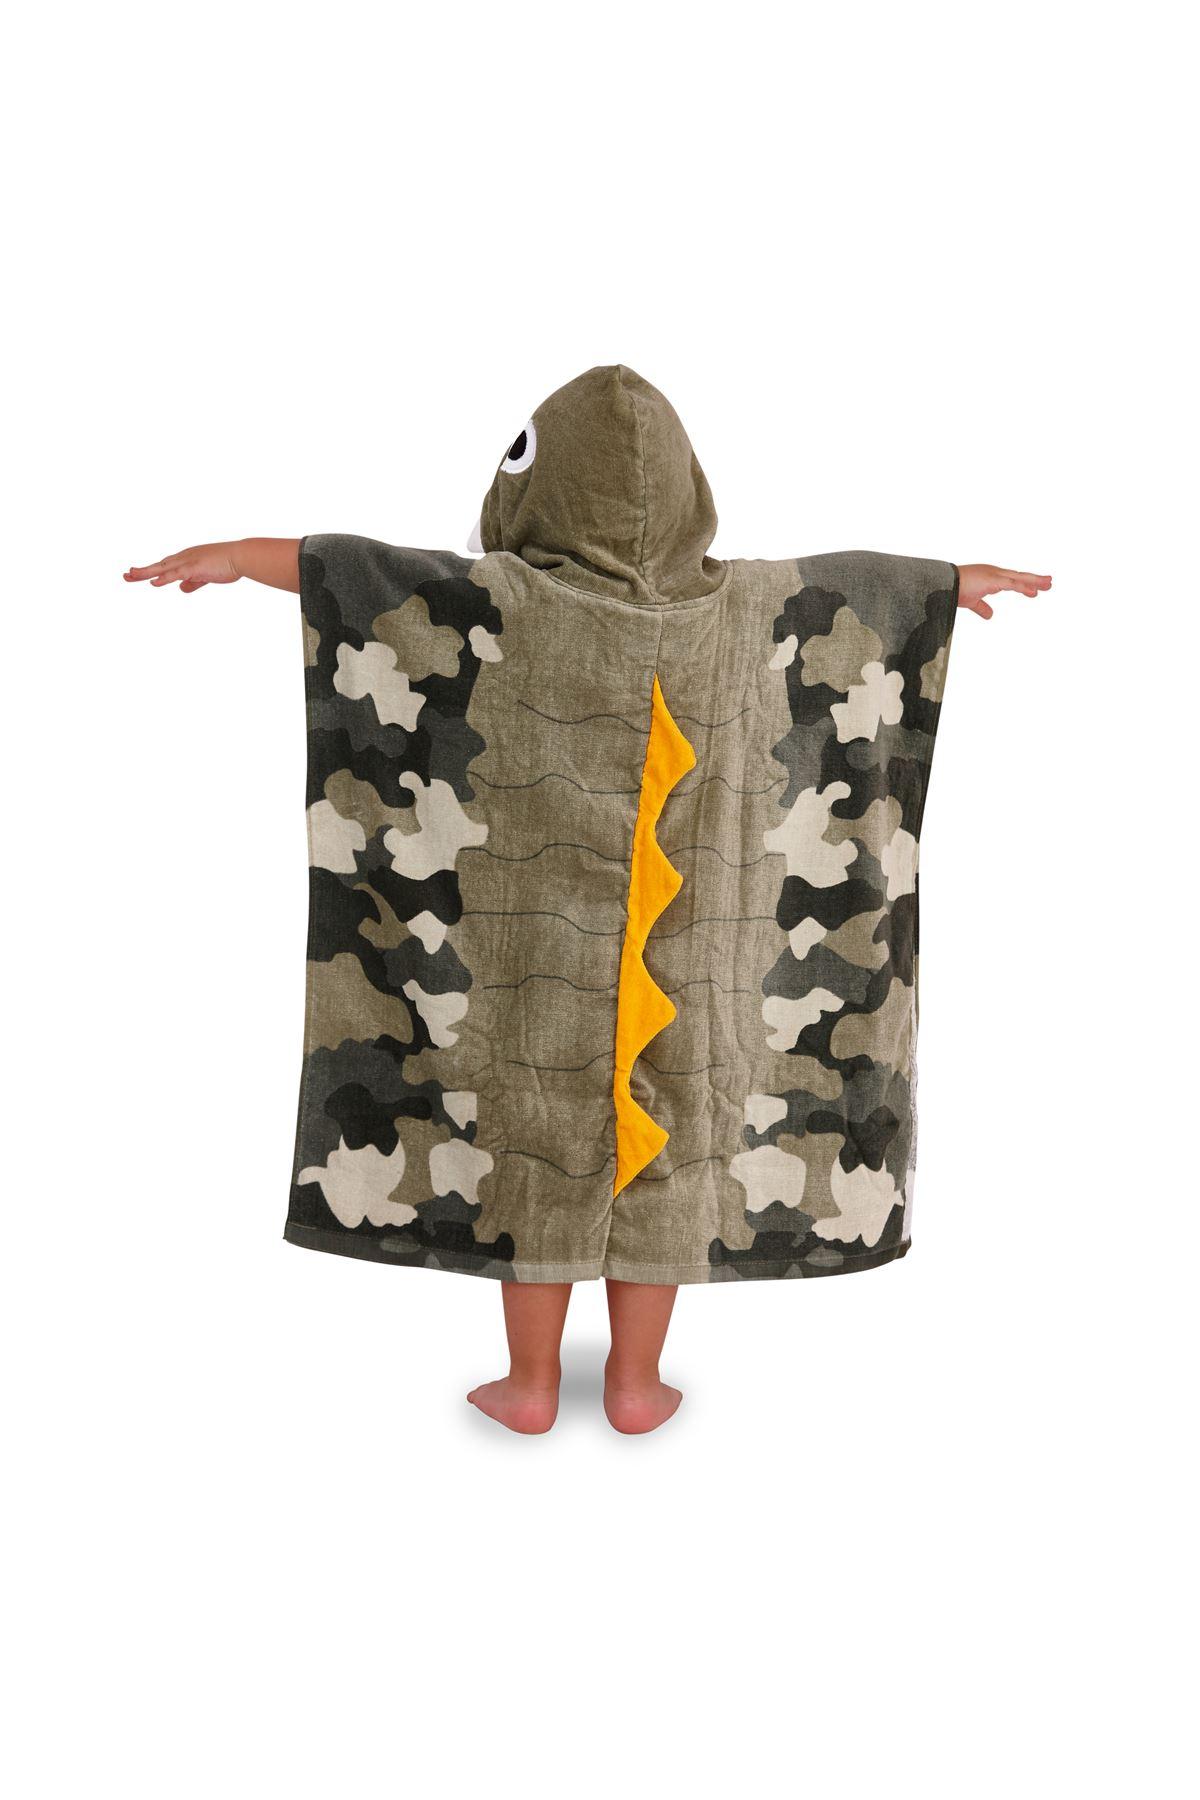 Childrens-Kids-Boys-Girls-Novelty-Hooded-Poncho-Swimming-Swim-Bath-Beach-Towel thumbnail 7